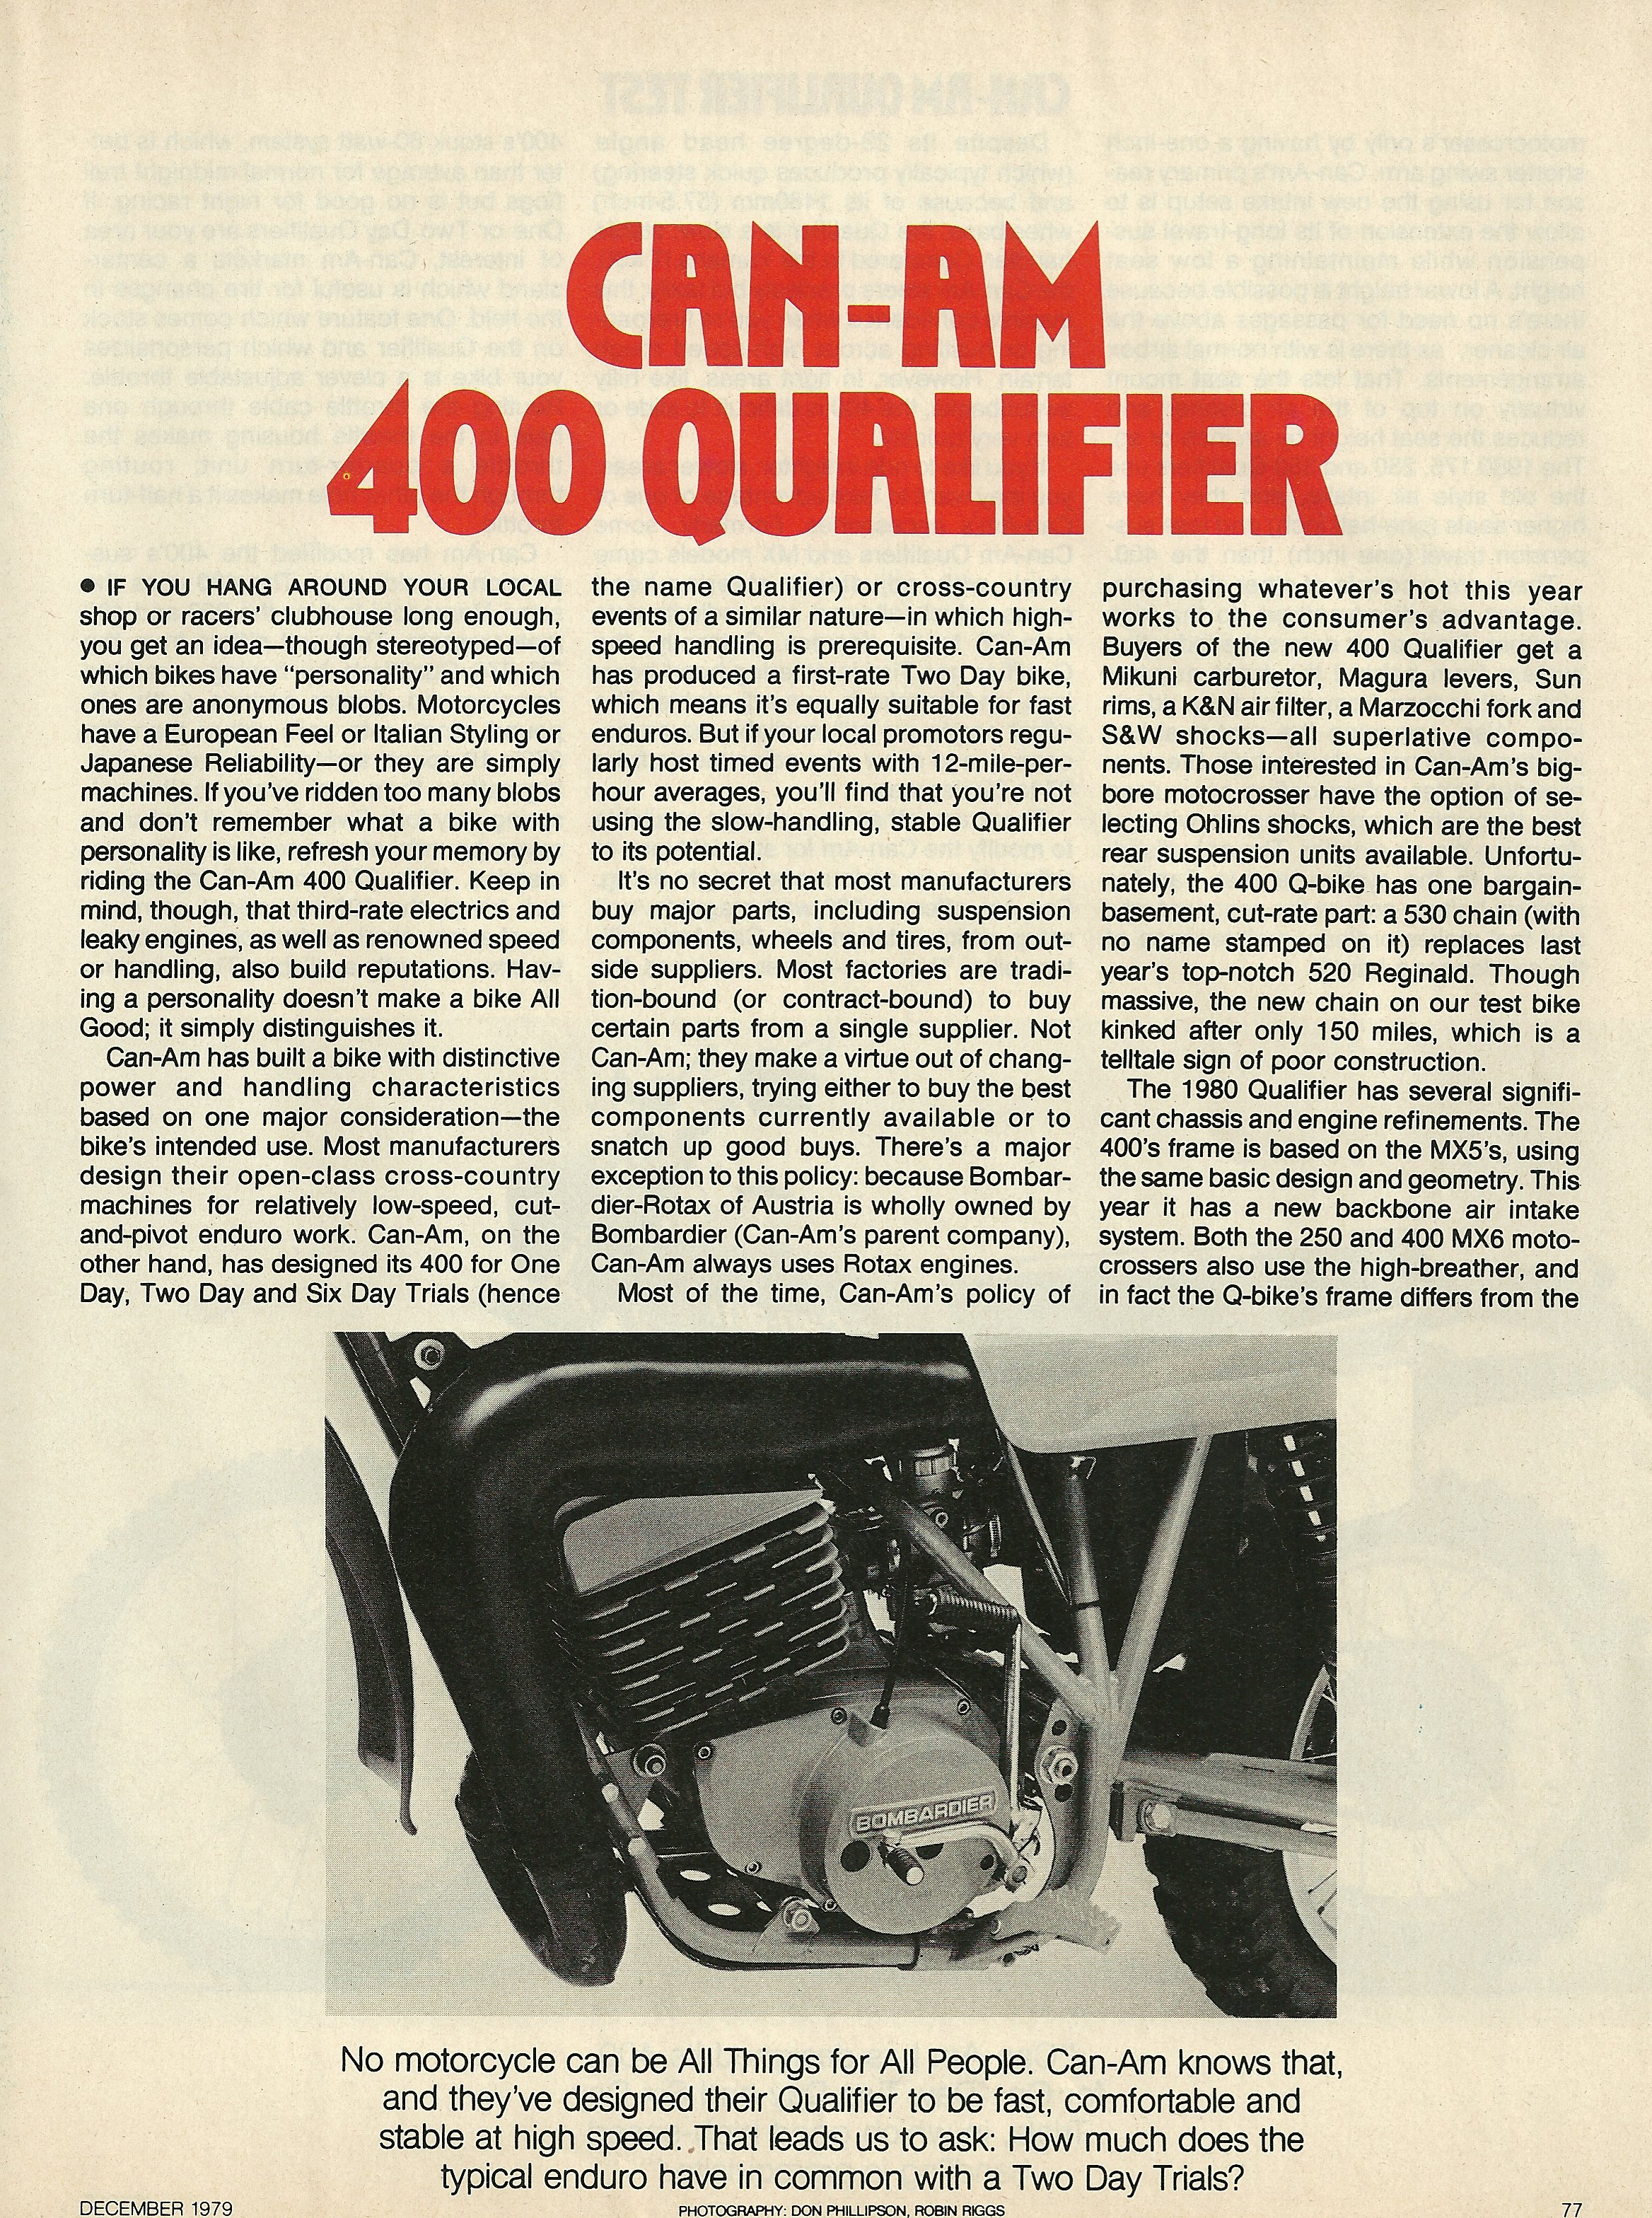 1980 Can-Am 400 Qualifier off road test 2.JPG